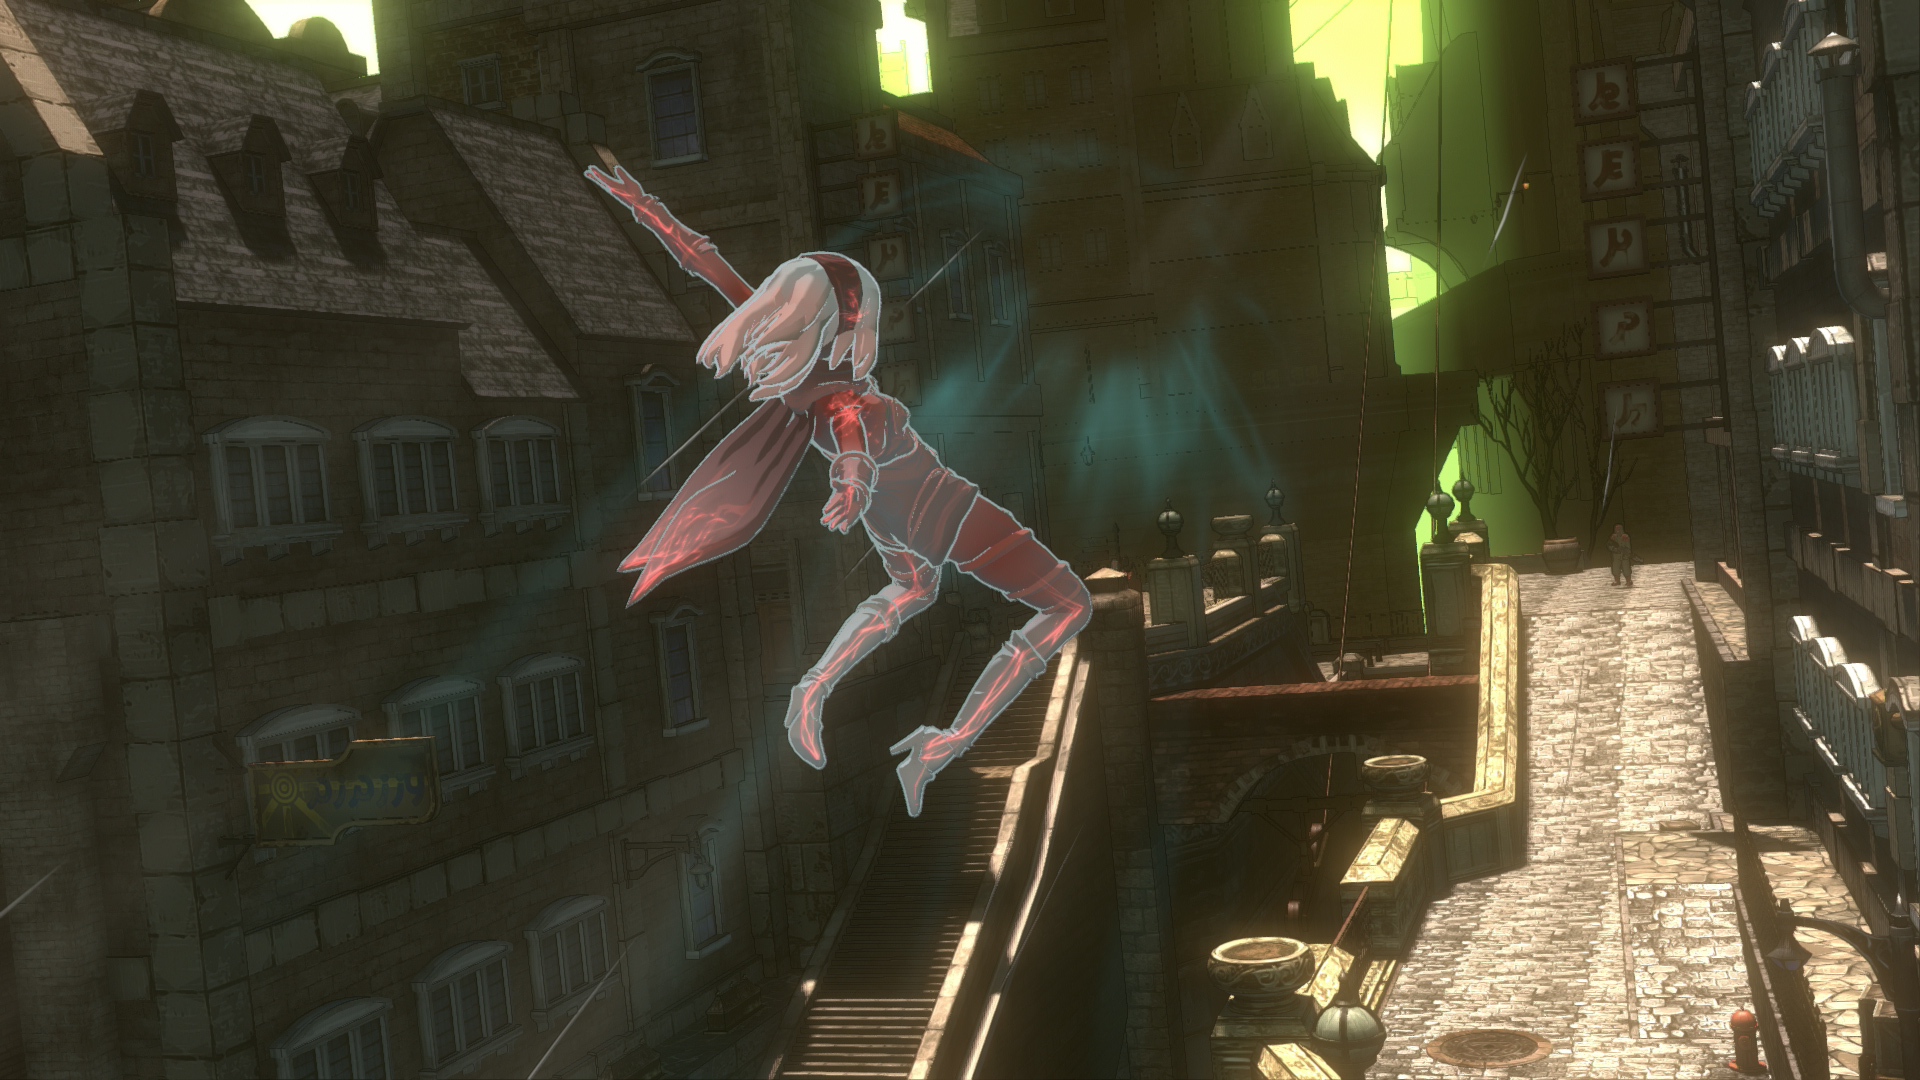 Сравнение графики Gravity Rush Remastered - PS4 vs PS ...: www.playground.ru/blogs/gravity_daze/sravnenie_grafiki_gravity_rush...